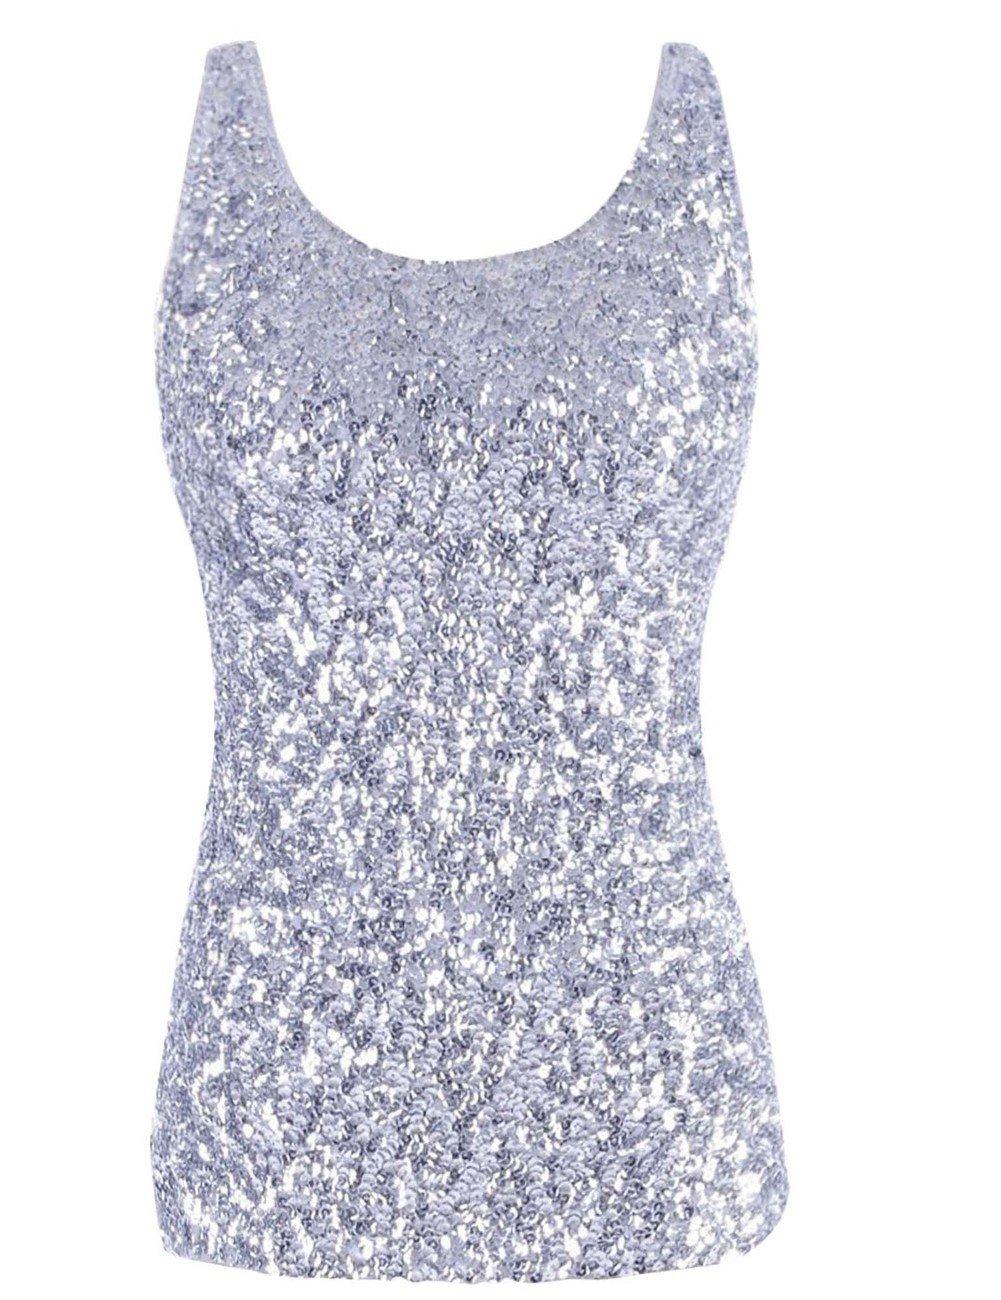 kayamiya Women's 1920S Style Glitter Sequined Vest Tank Tops L Silver